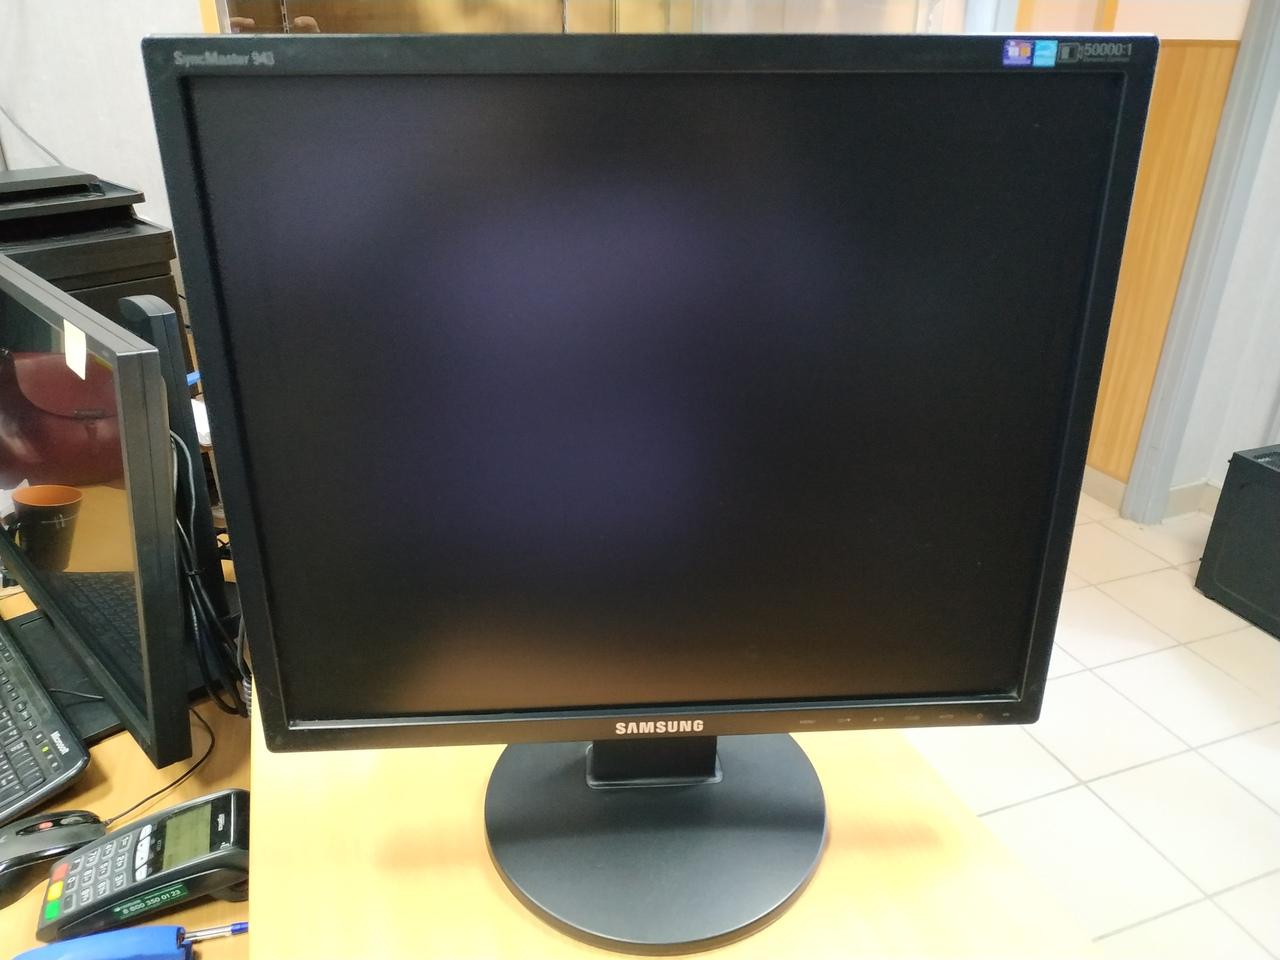 монитор Samsung SyncMaster 943N | фото 1 из 1